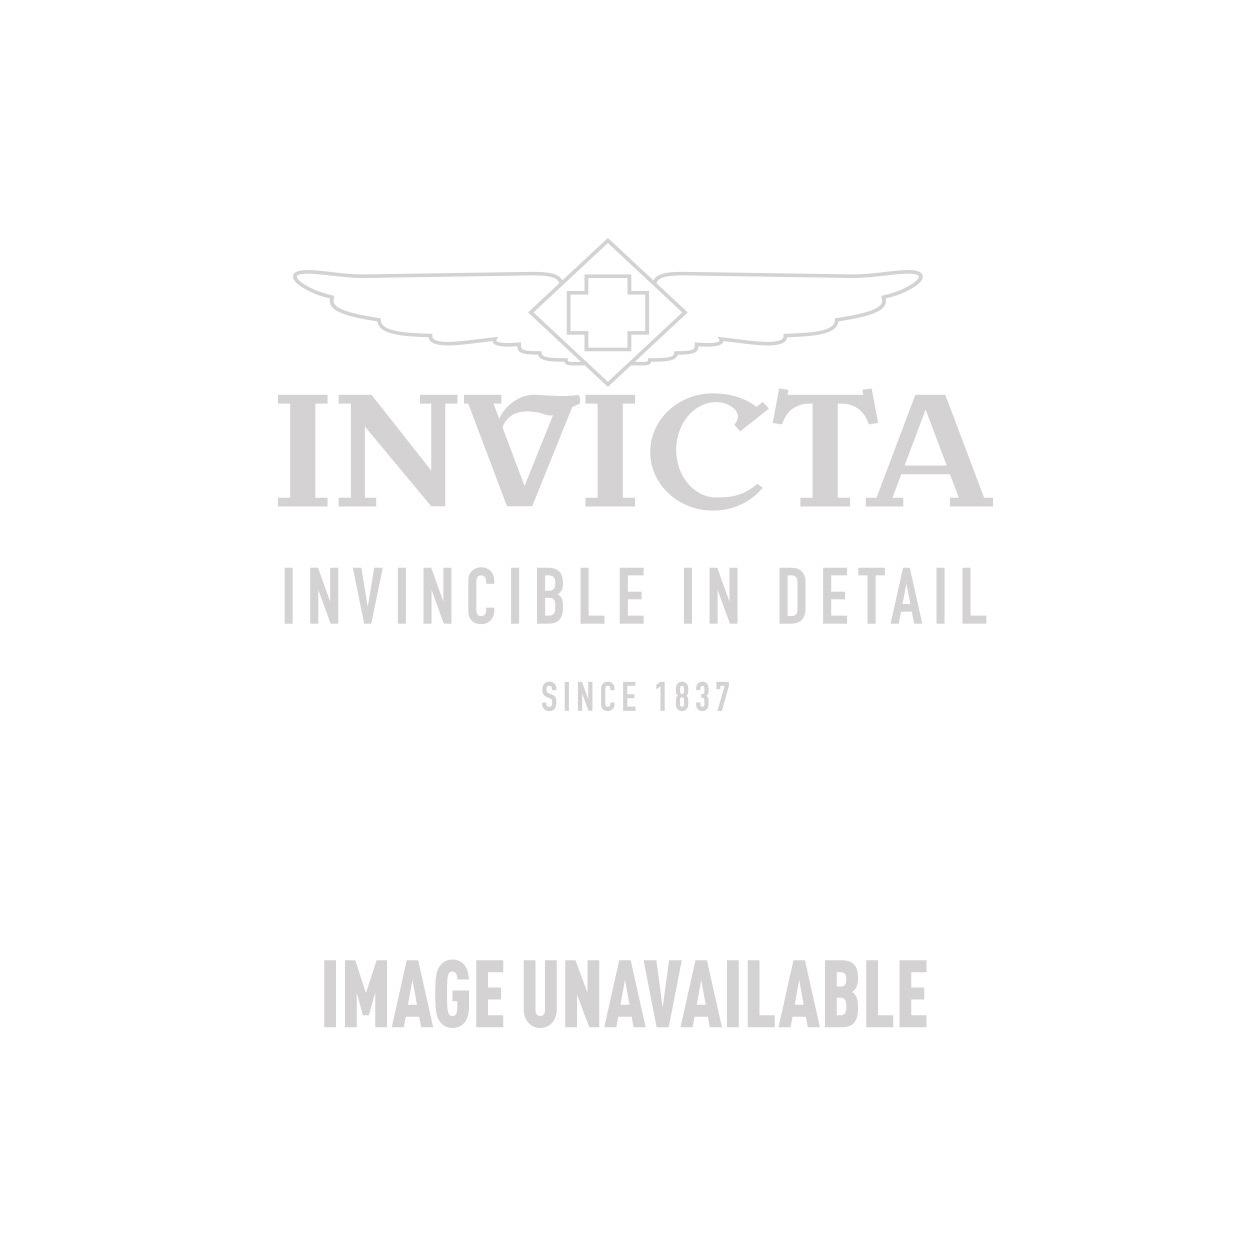 Invicta  Reserve Arsenal  Quartz Watch - Rose Gold case with Black tone Polyurethane band - Model 11175